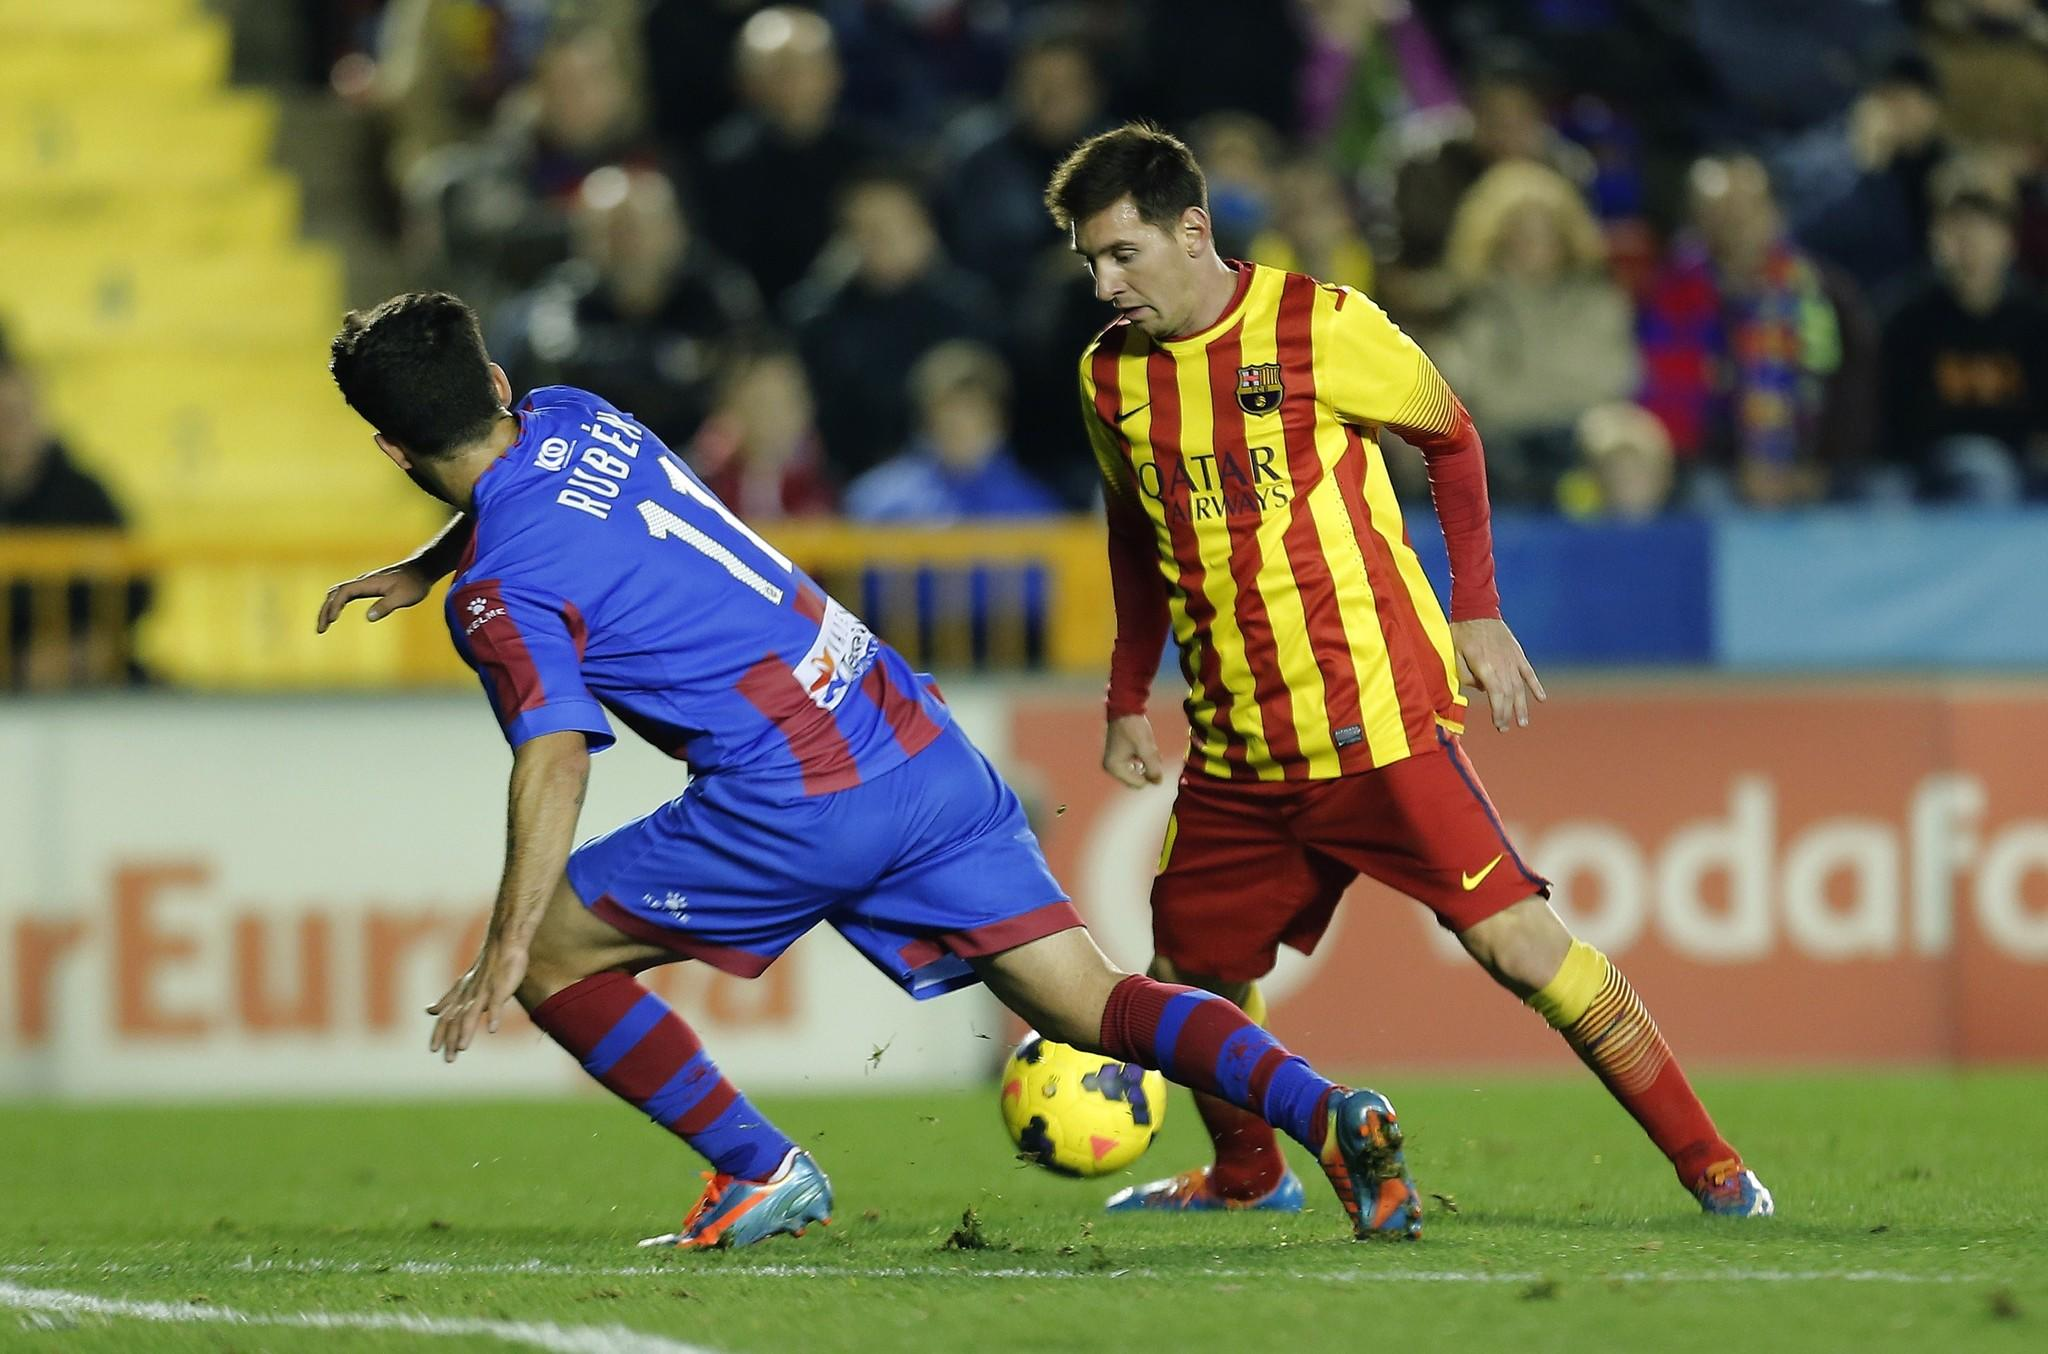 Levante's midfielder Ruben Garcia (L) vies with Barcelona's Argentinian forward Lionel Messi during the Spanish league football match Levante vs Barcelona at the Ciutat de Valencia Stadium in Valencia on January 19, 2014.